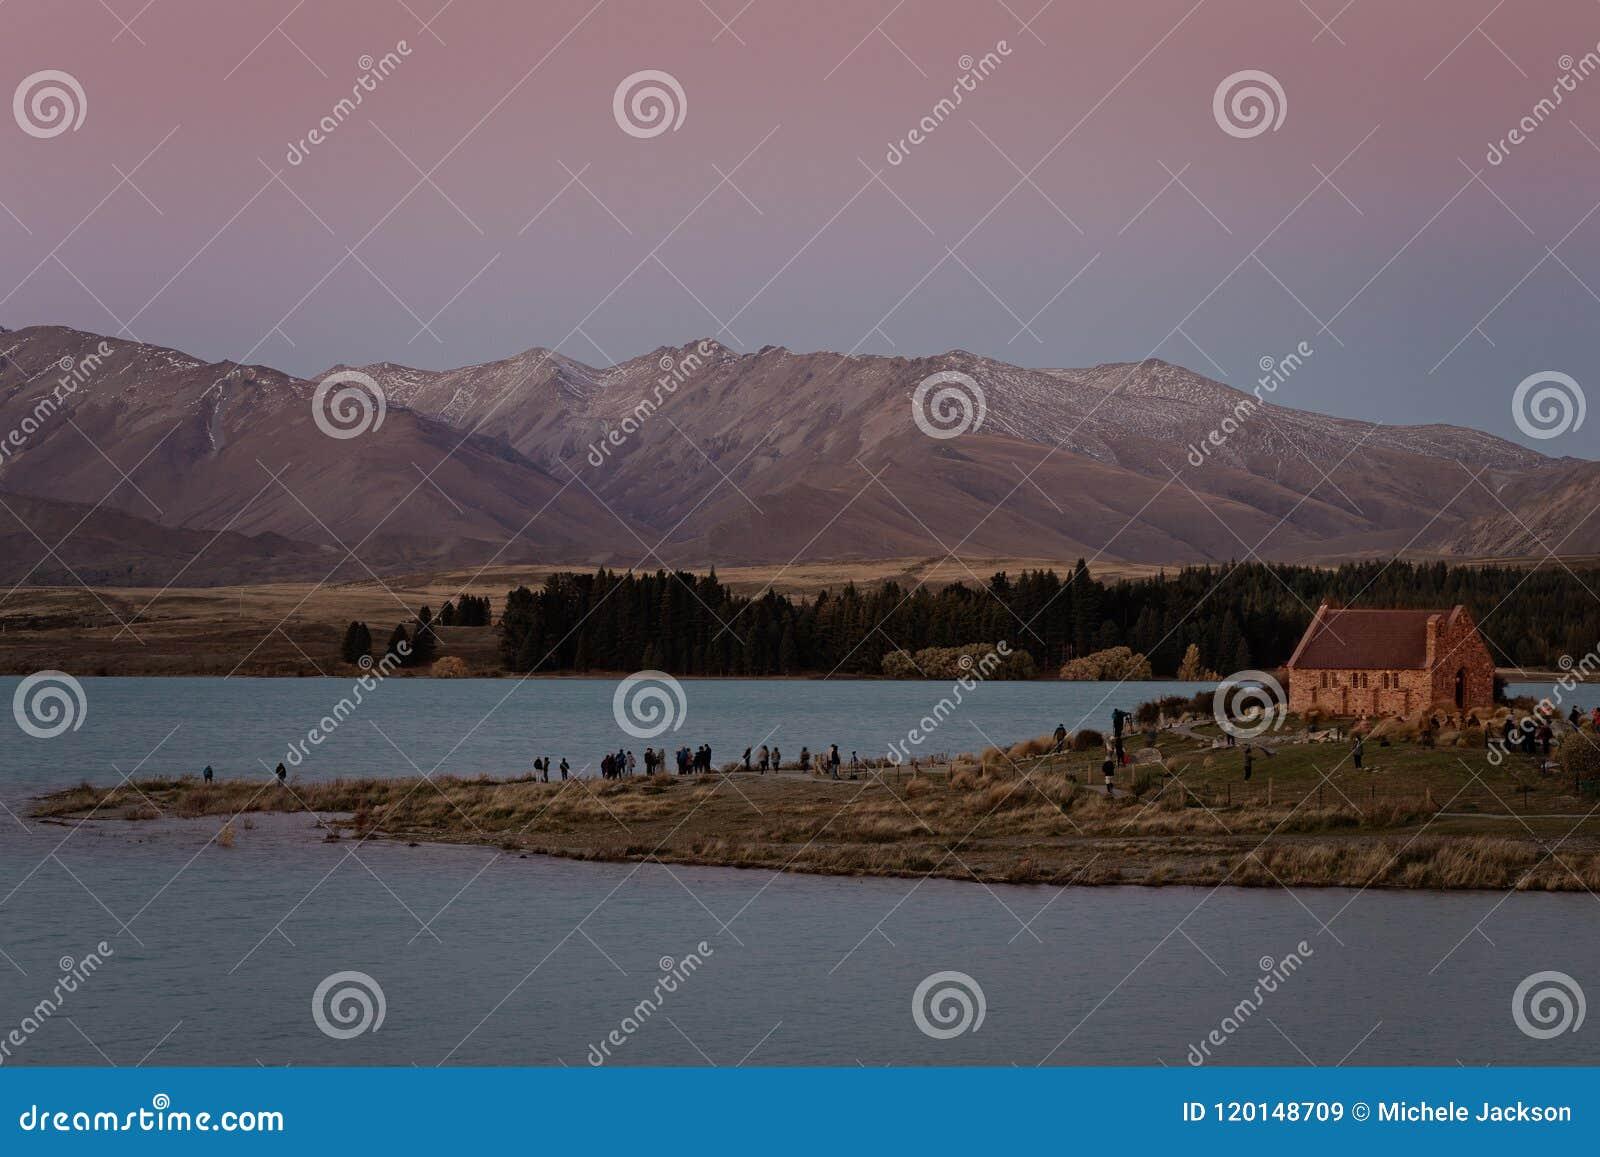 The Church Of The Good Shepherd On Lake Tekapo In New Zealand